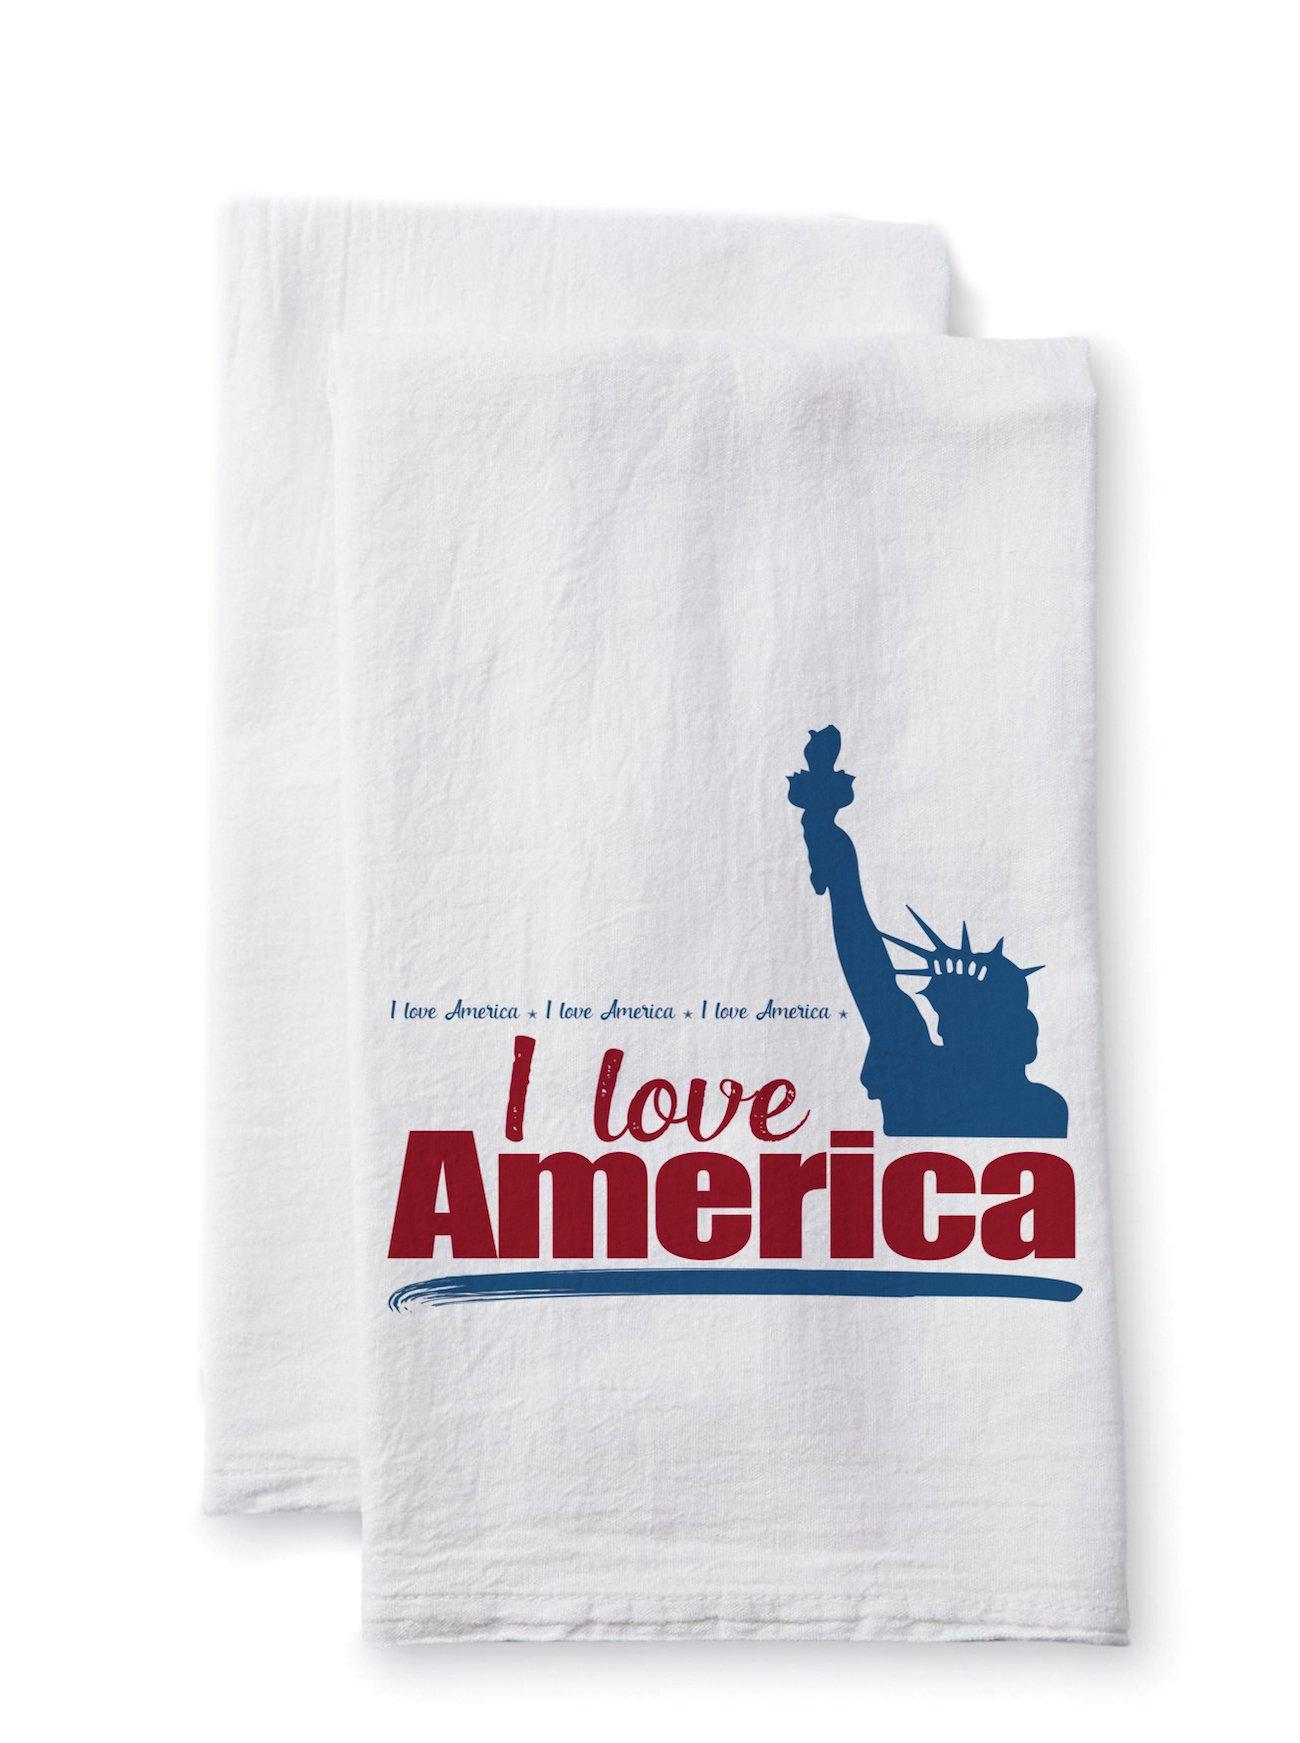 Sullivans Uplifting Linens Towels I Love America, 28 x 28 Inches, White (ULTL118) 2-Pack